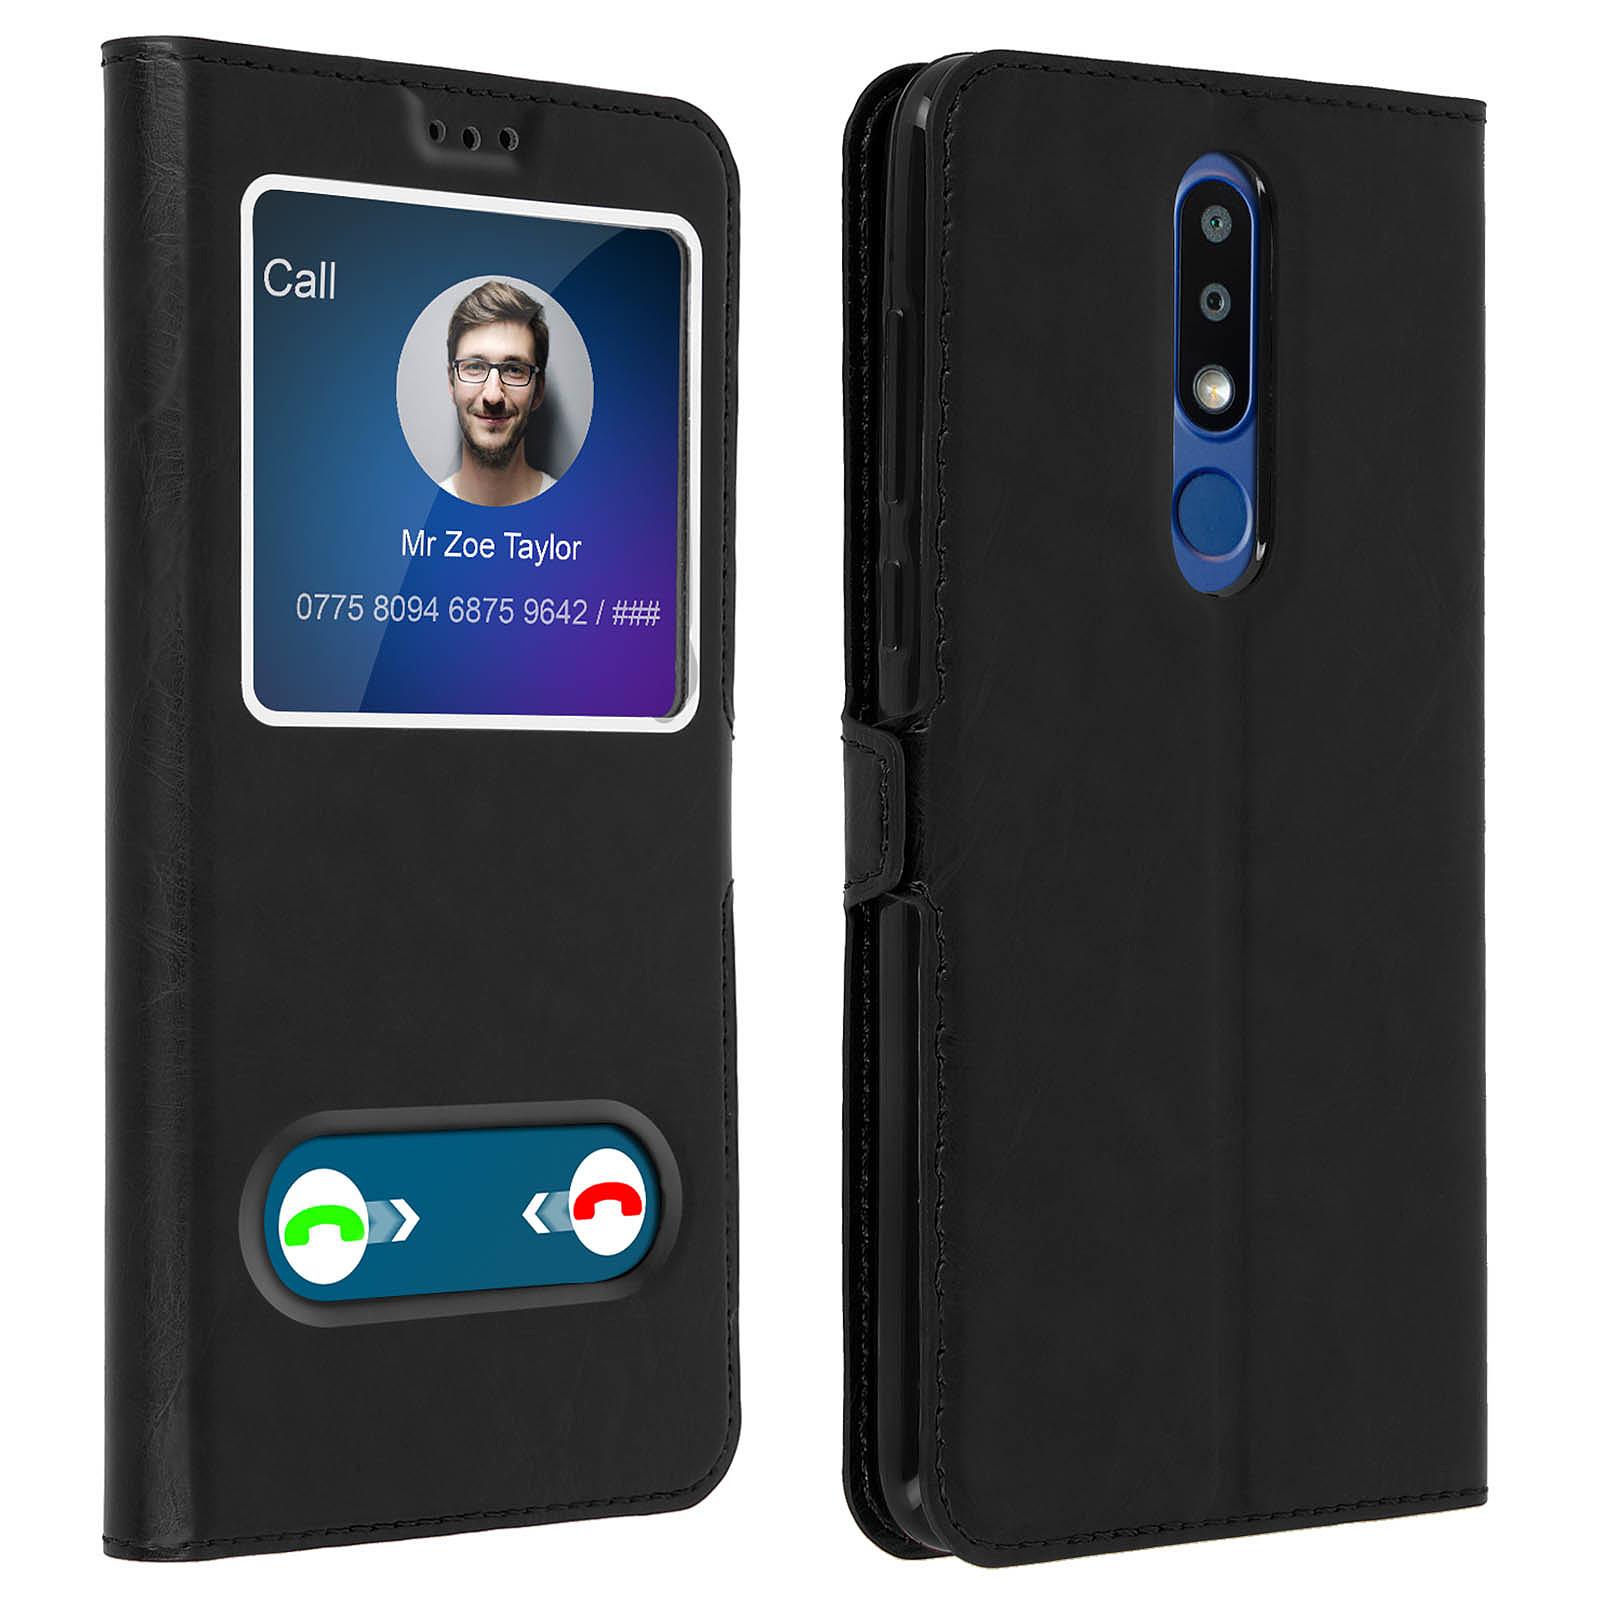 Avizar Etui folio Noir pour Nokia 3.1 Plus